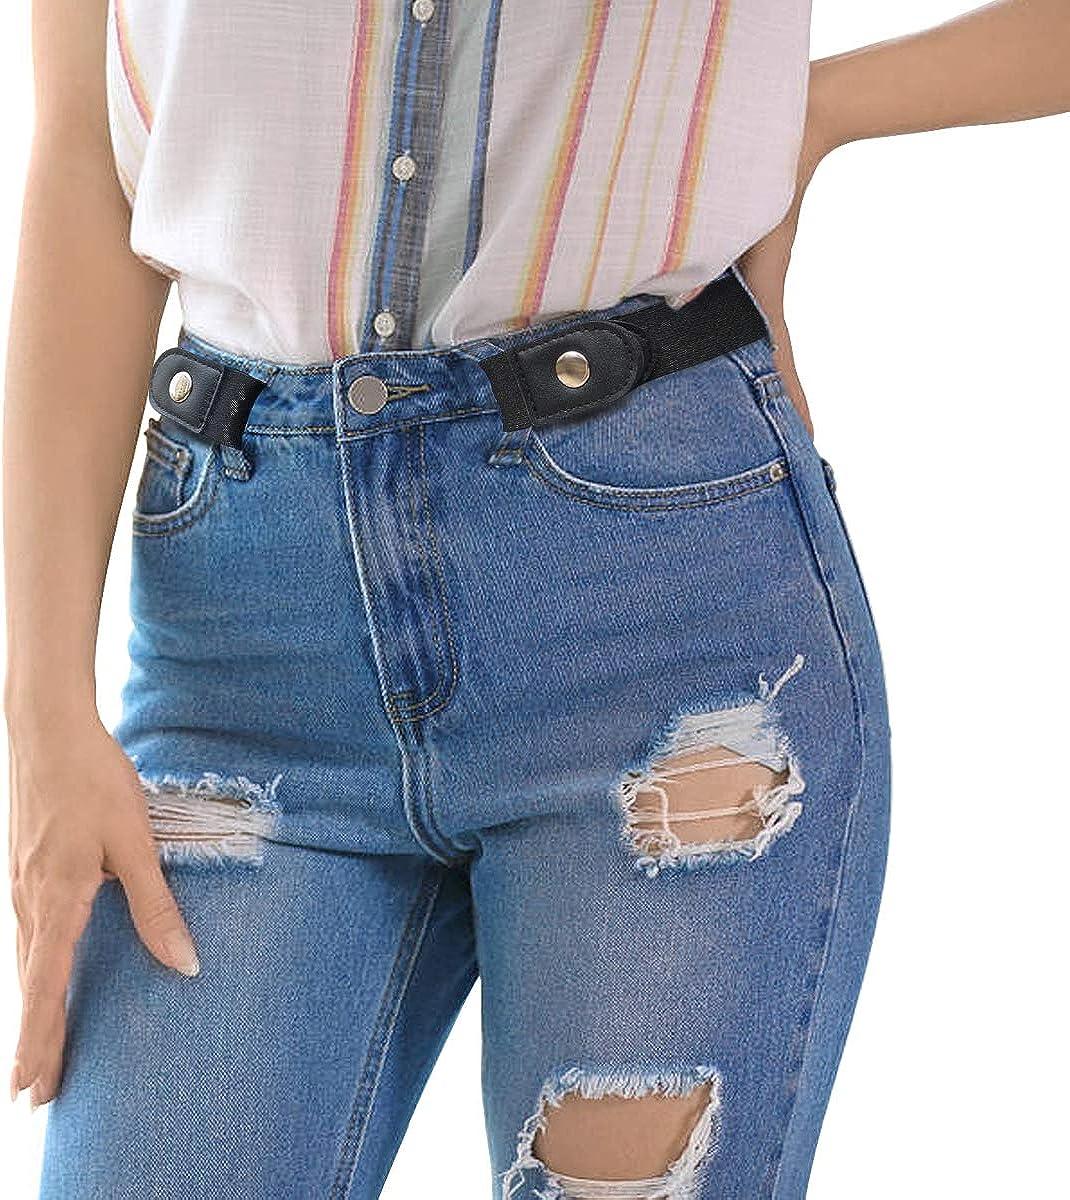 No Buckle Stretch Belt for ILIVABLE Superlatite Women Brand Cheap Sale Venue Backing Men Non-Slip